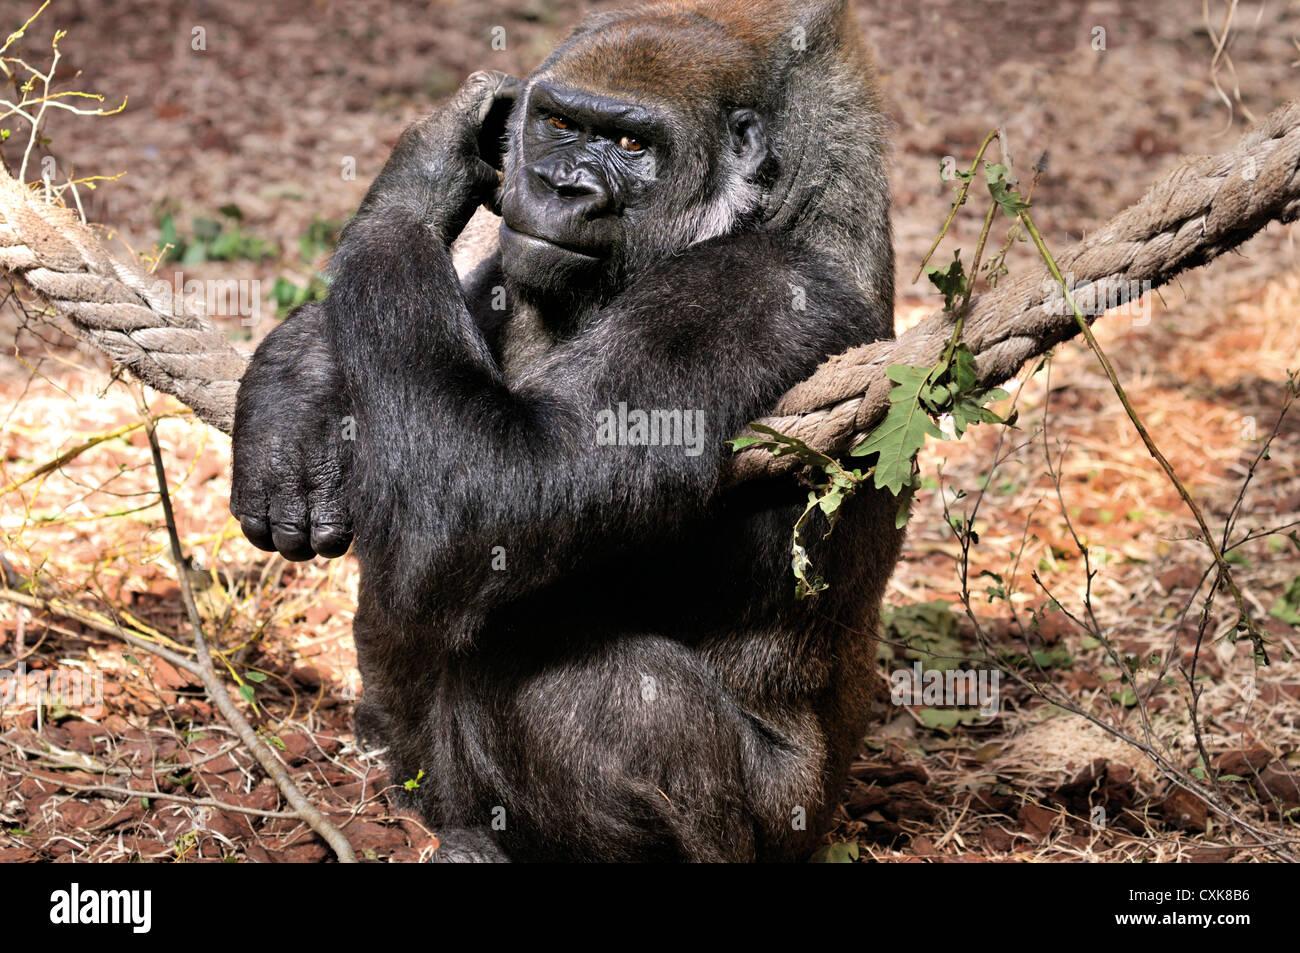 Spain, Cantabria: Gorilla (Gorilla gorilla) in the Animal Park Carbaceno near Santander - Stock Image